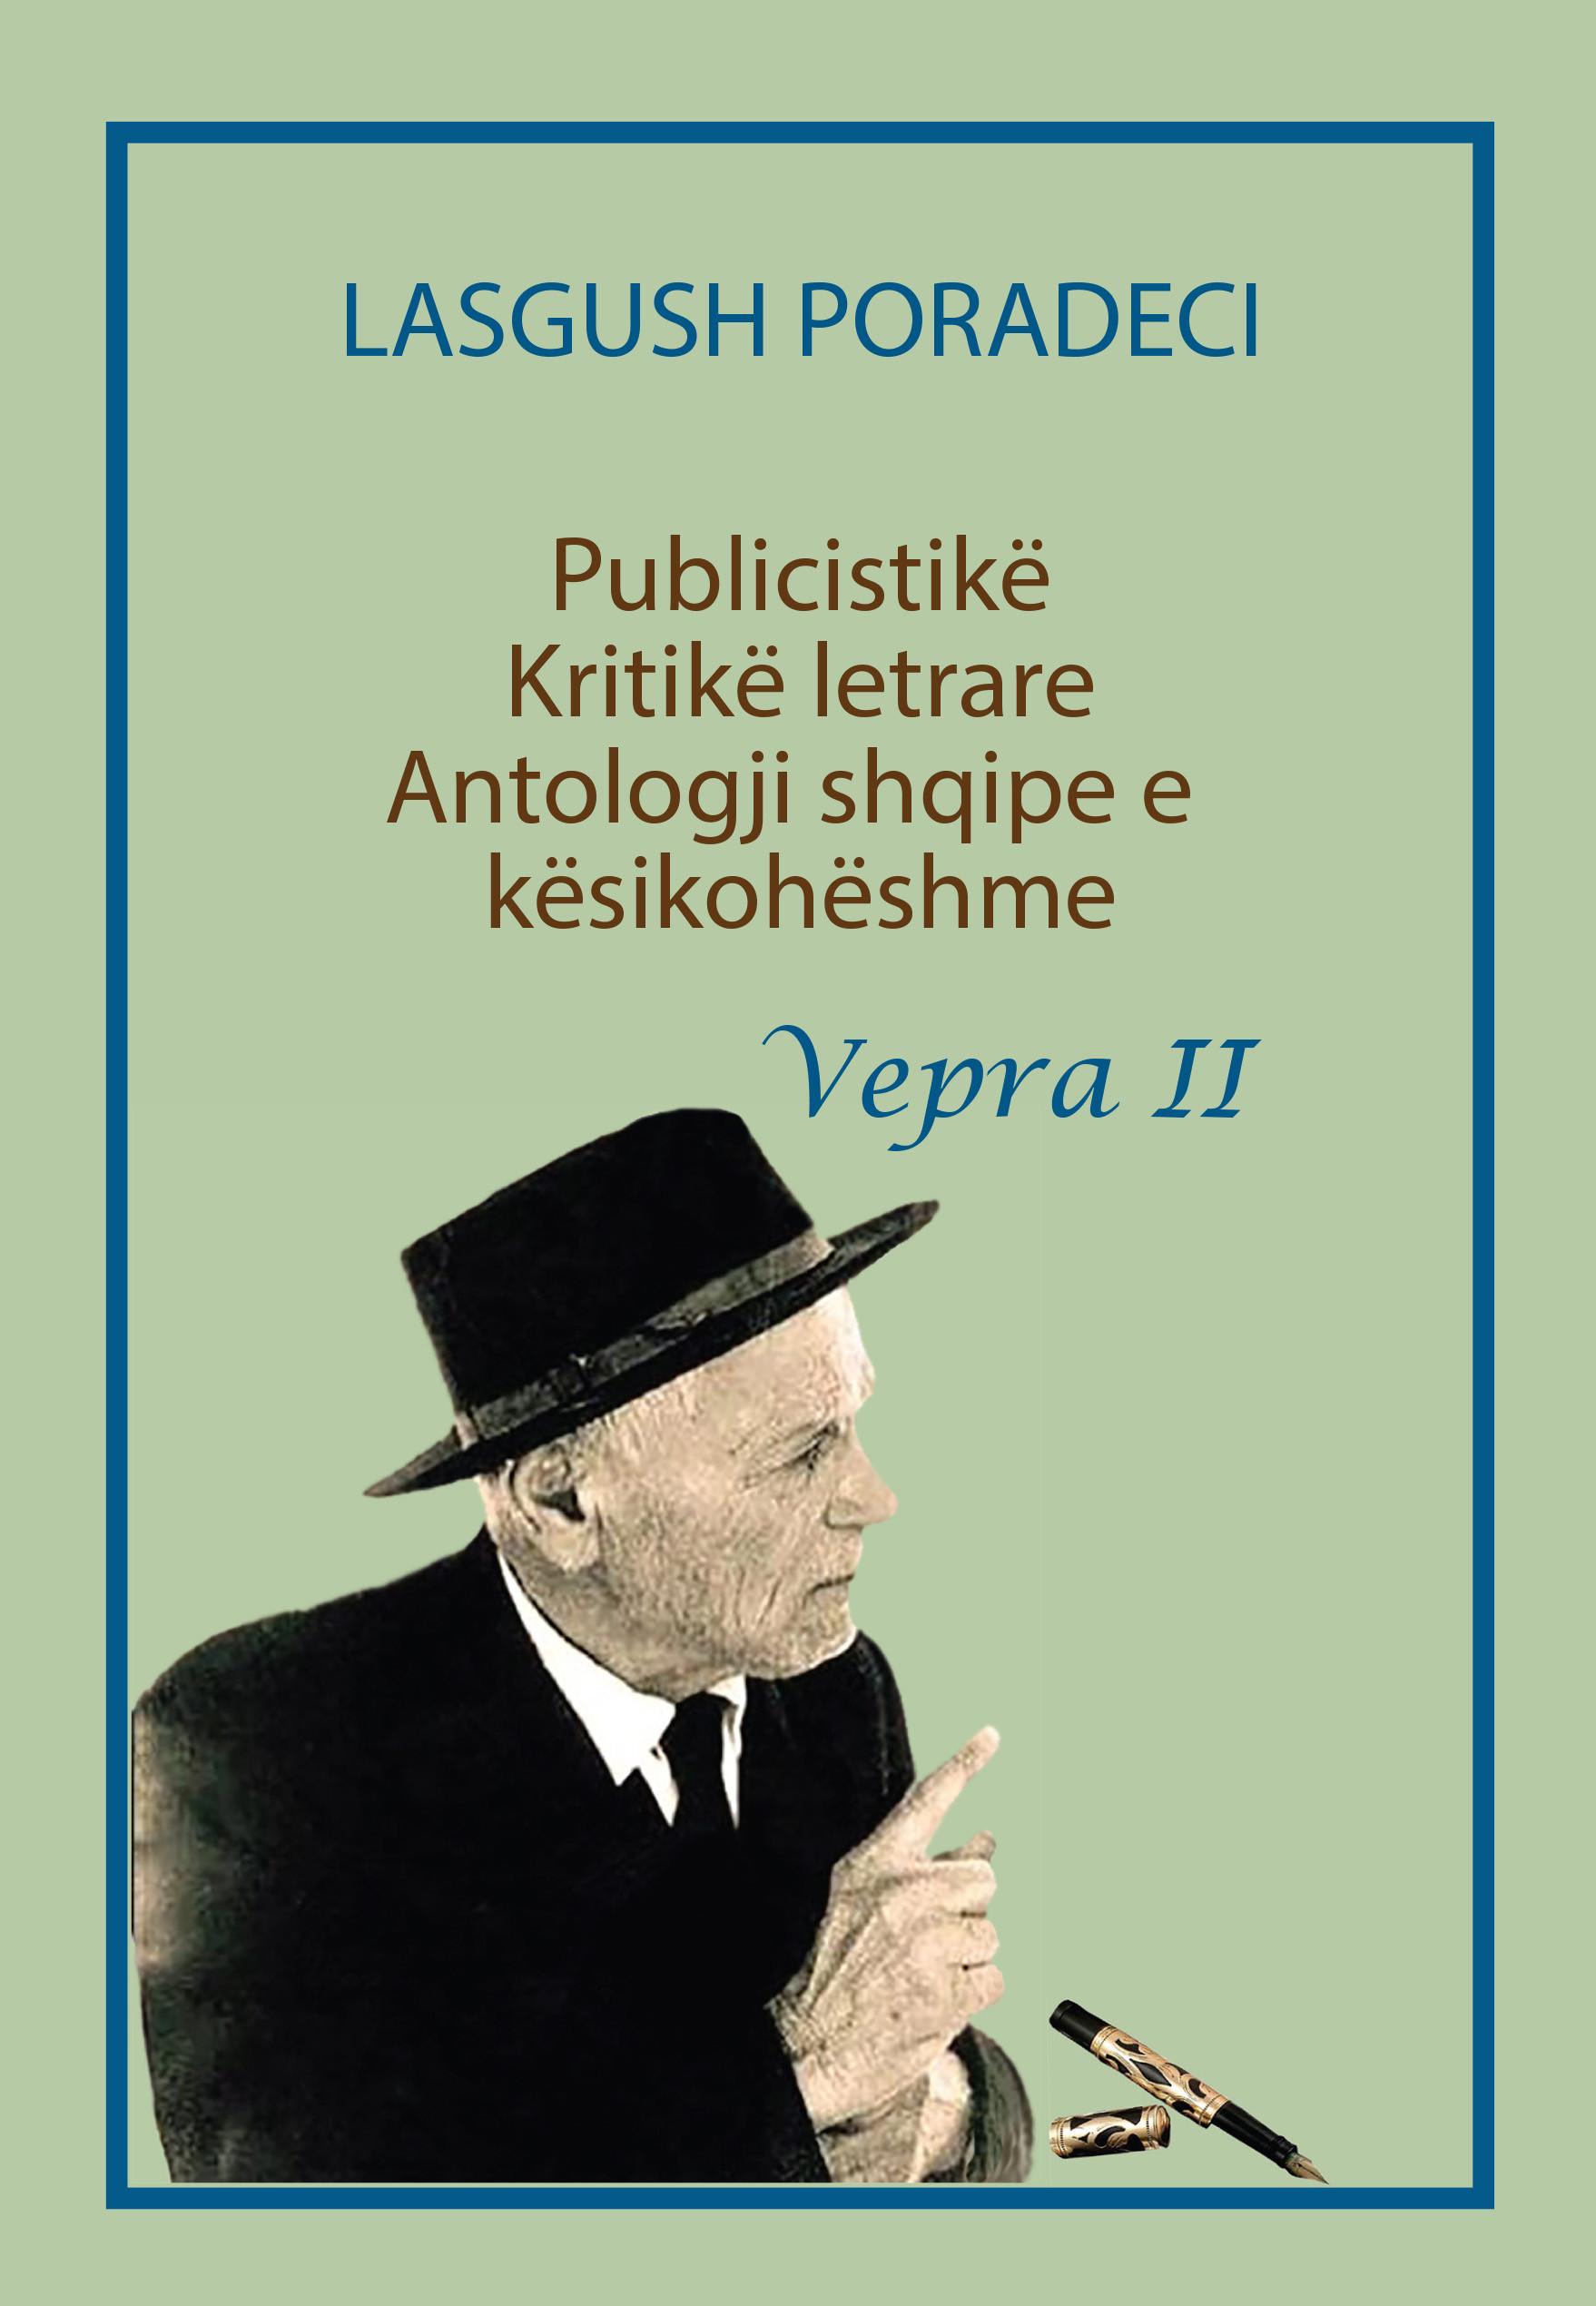 Lasgush Poradeci - Vepra II